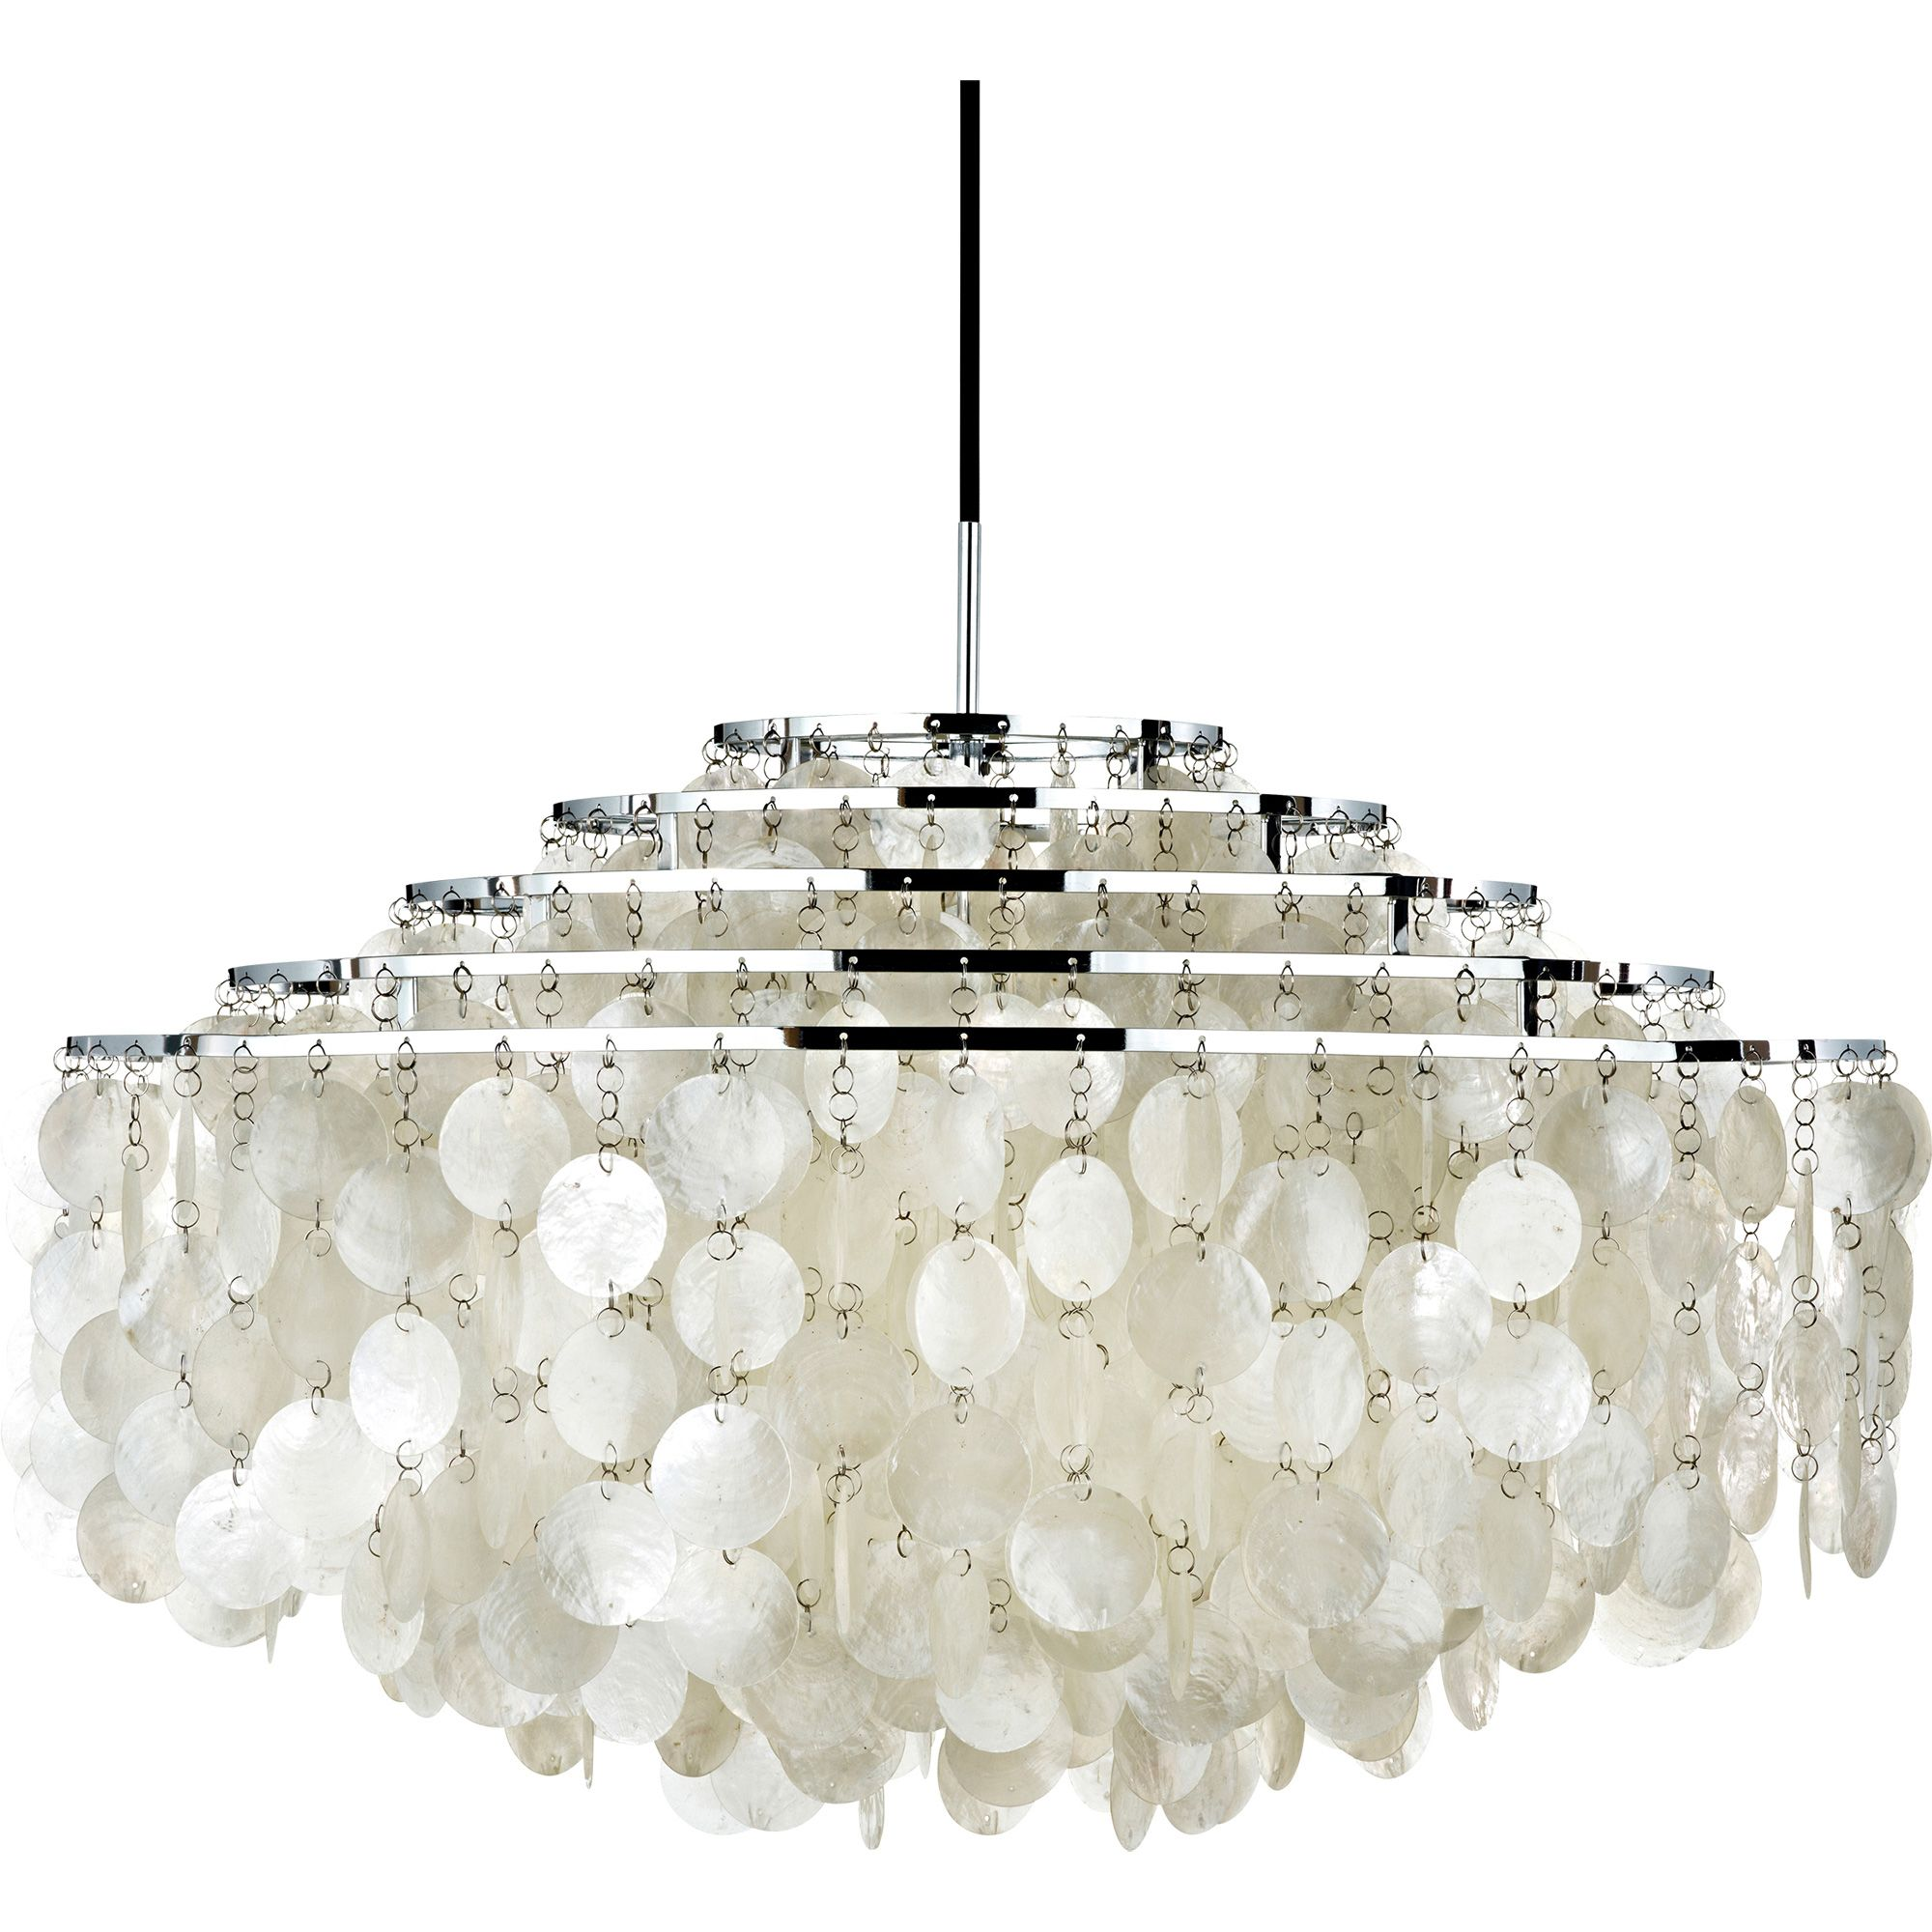 Fun 11DM Pendant by Verpan | 11530606301001 | Pendant light